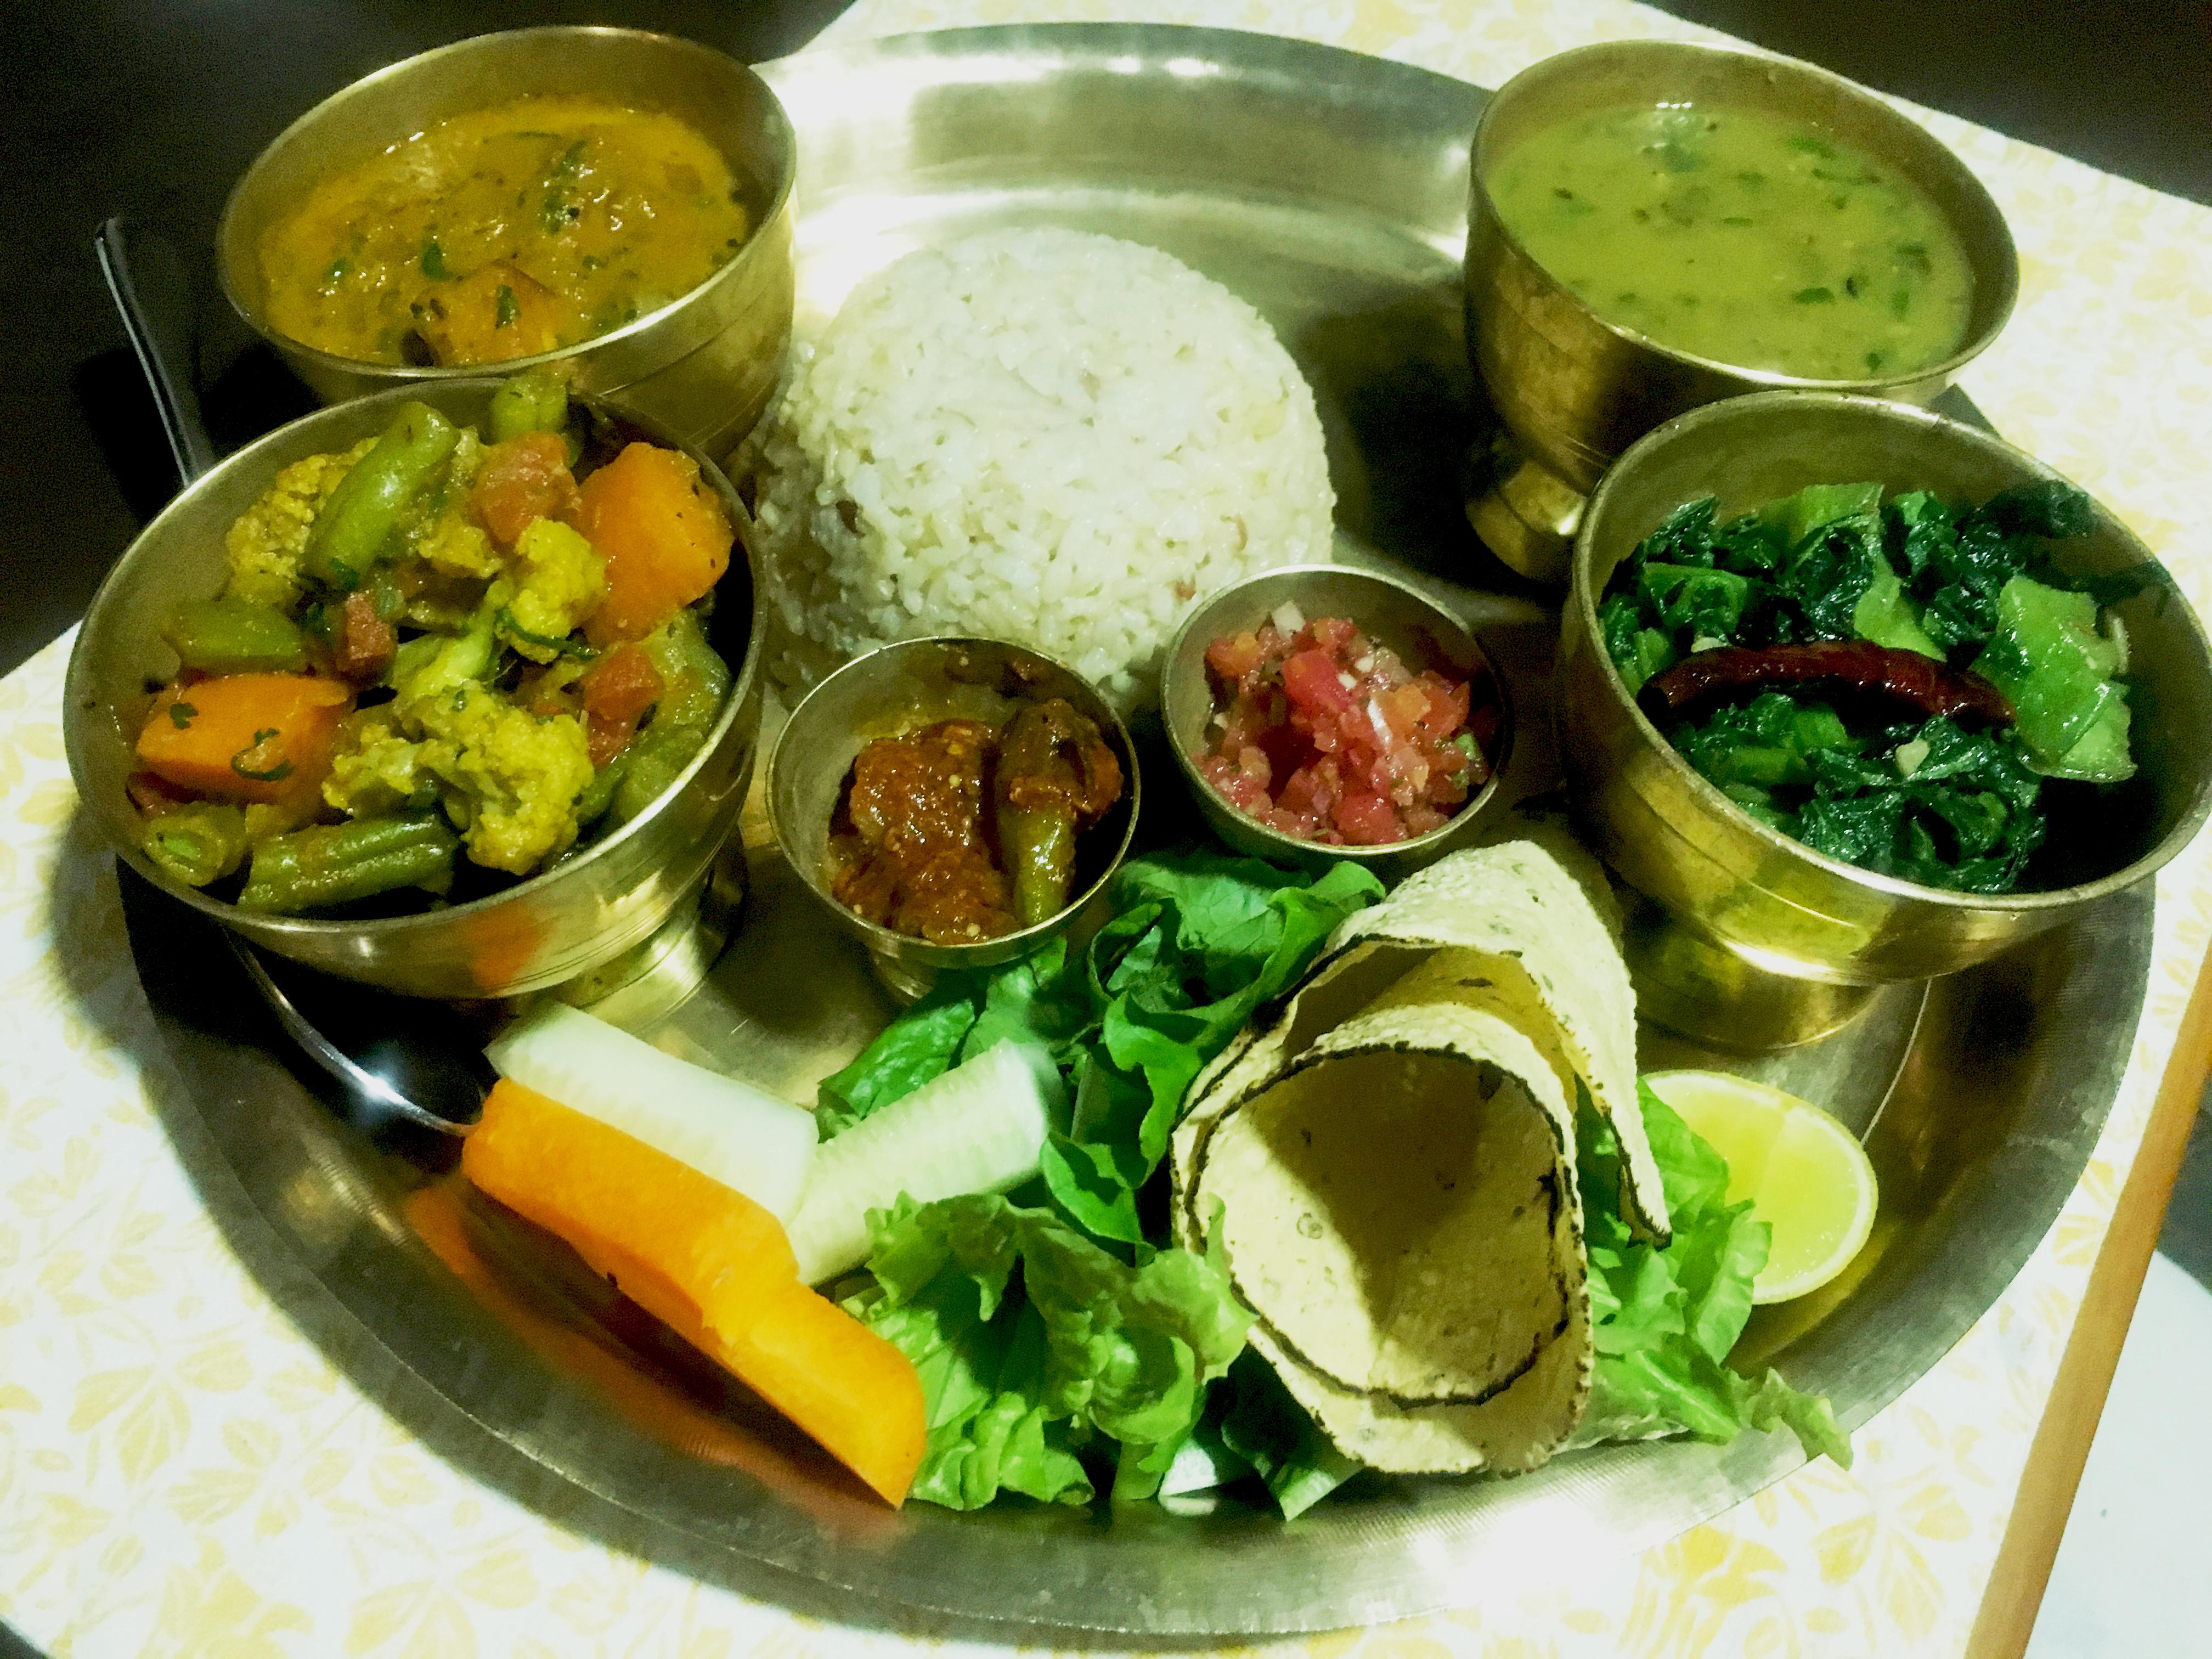 Kathmandu cravings: Top Nepal foods you can't miss | CNN Travel